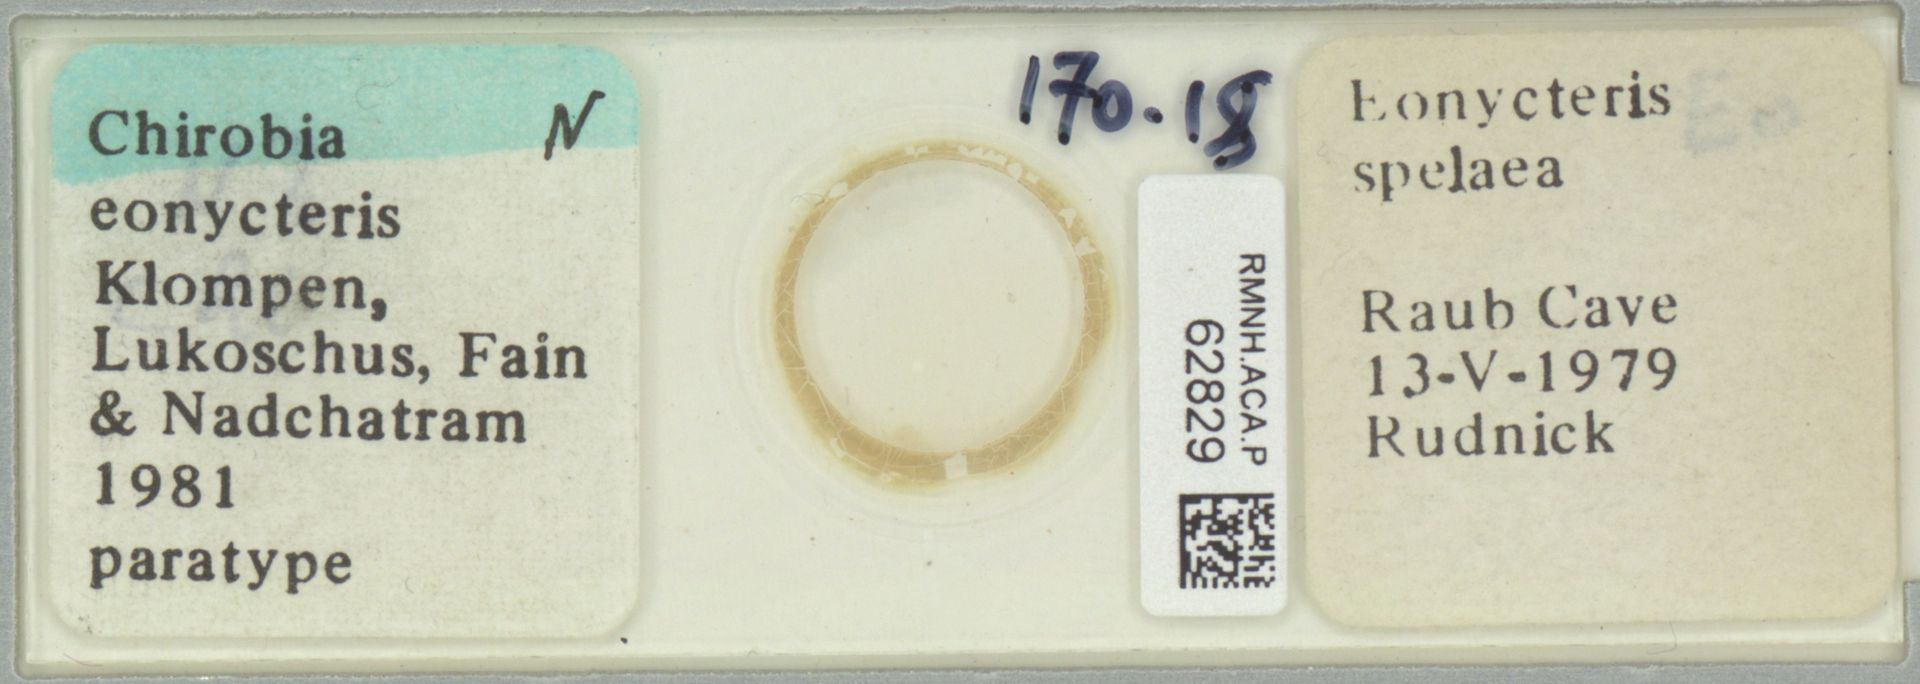 RMNH.ACA.P.62829 | Chirobia eonycteris Klompen, Lukoschus, Fain & Nadchatram 1981